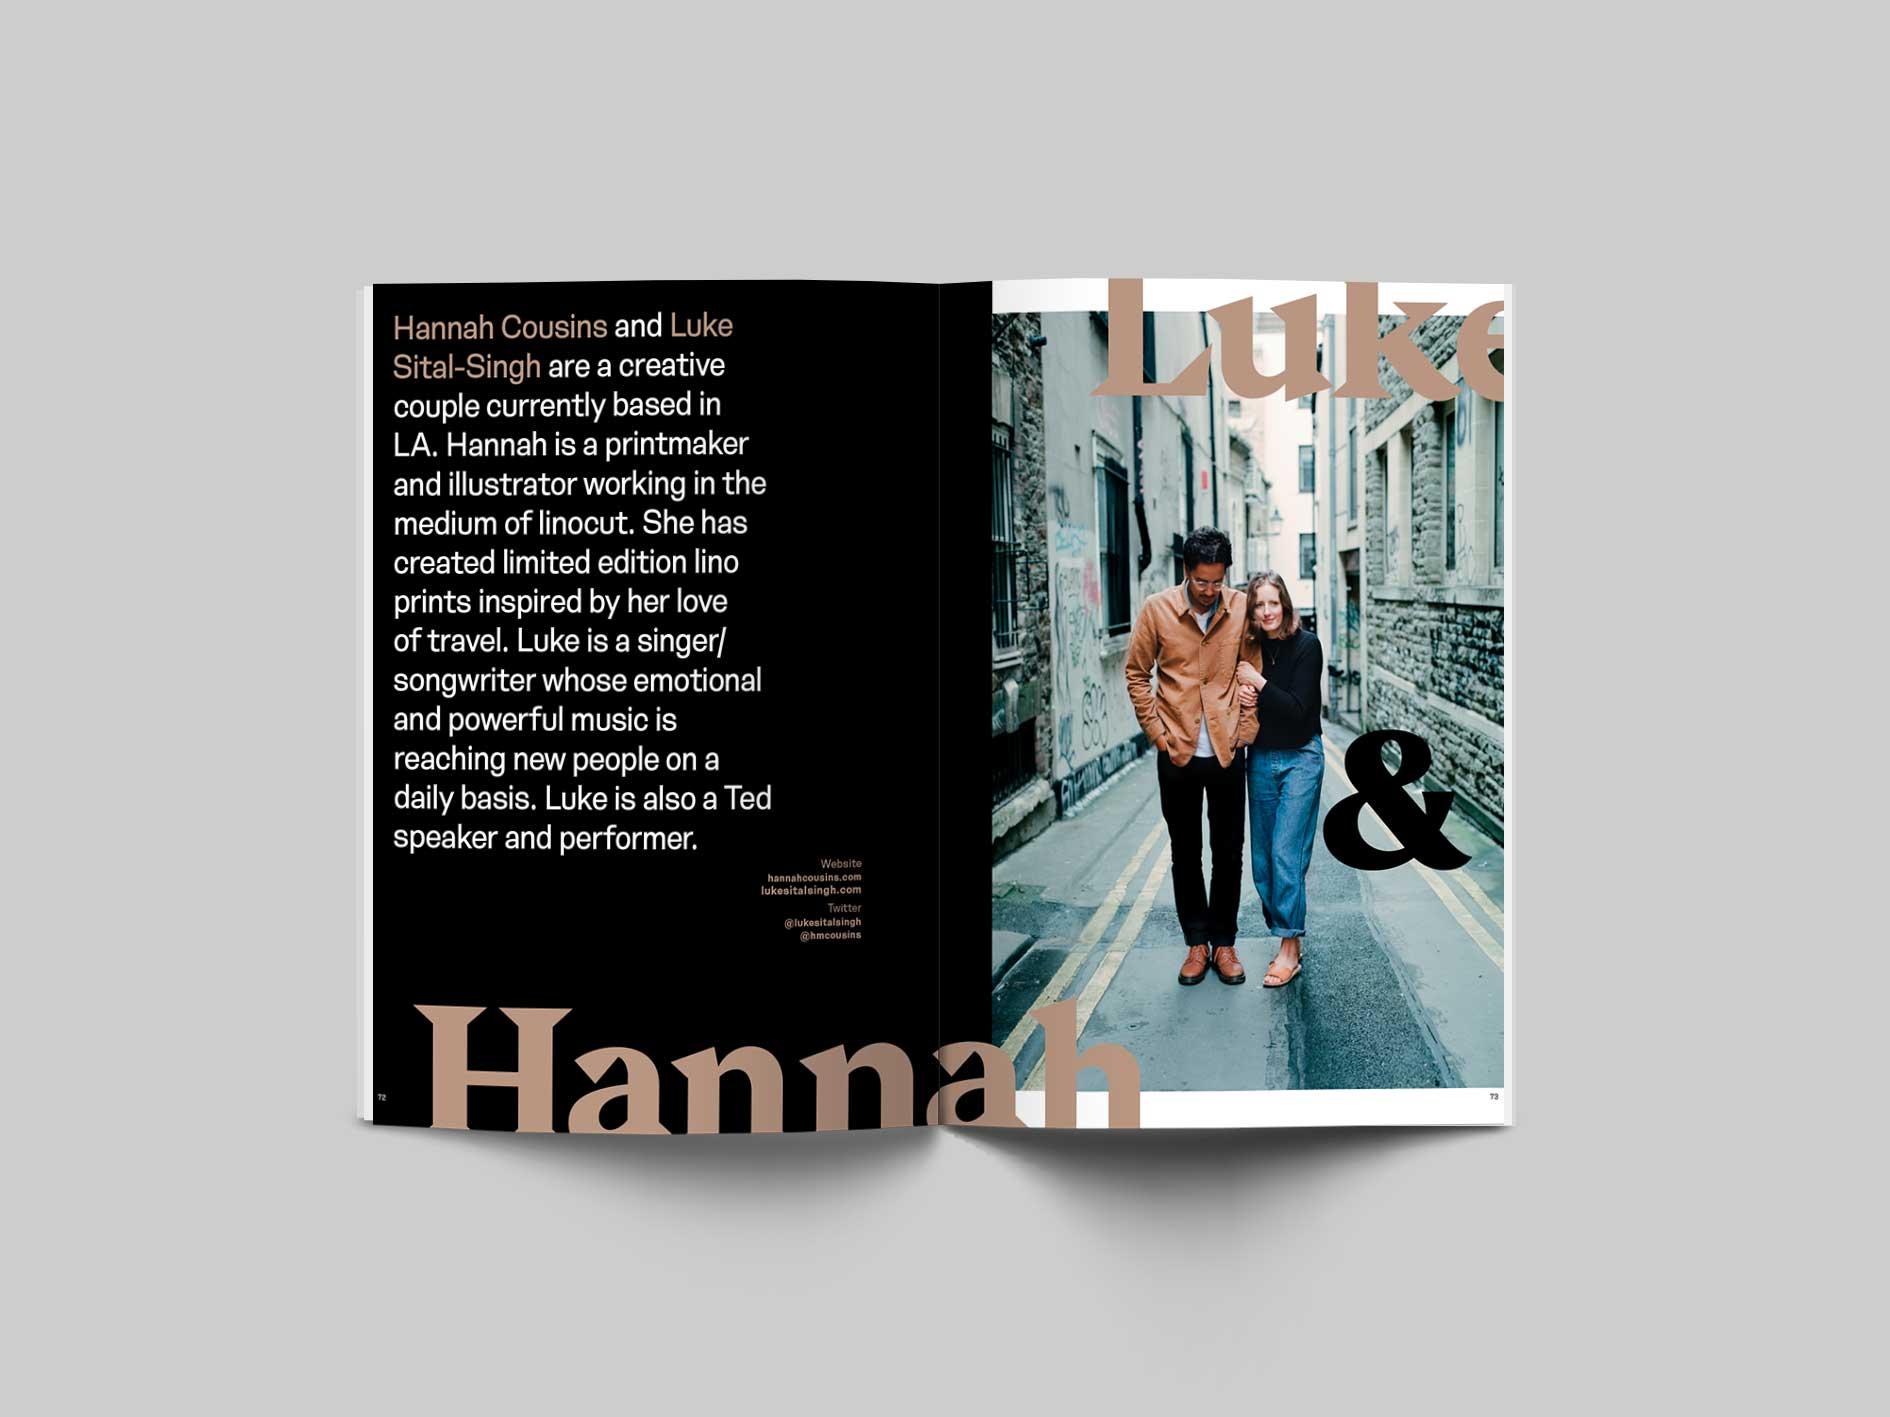 Volume 4 of 99 Percent Lifestyle Magazine